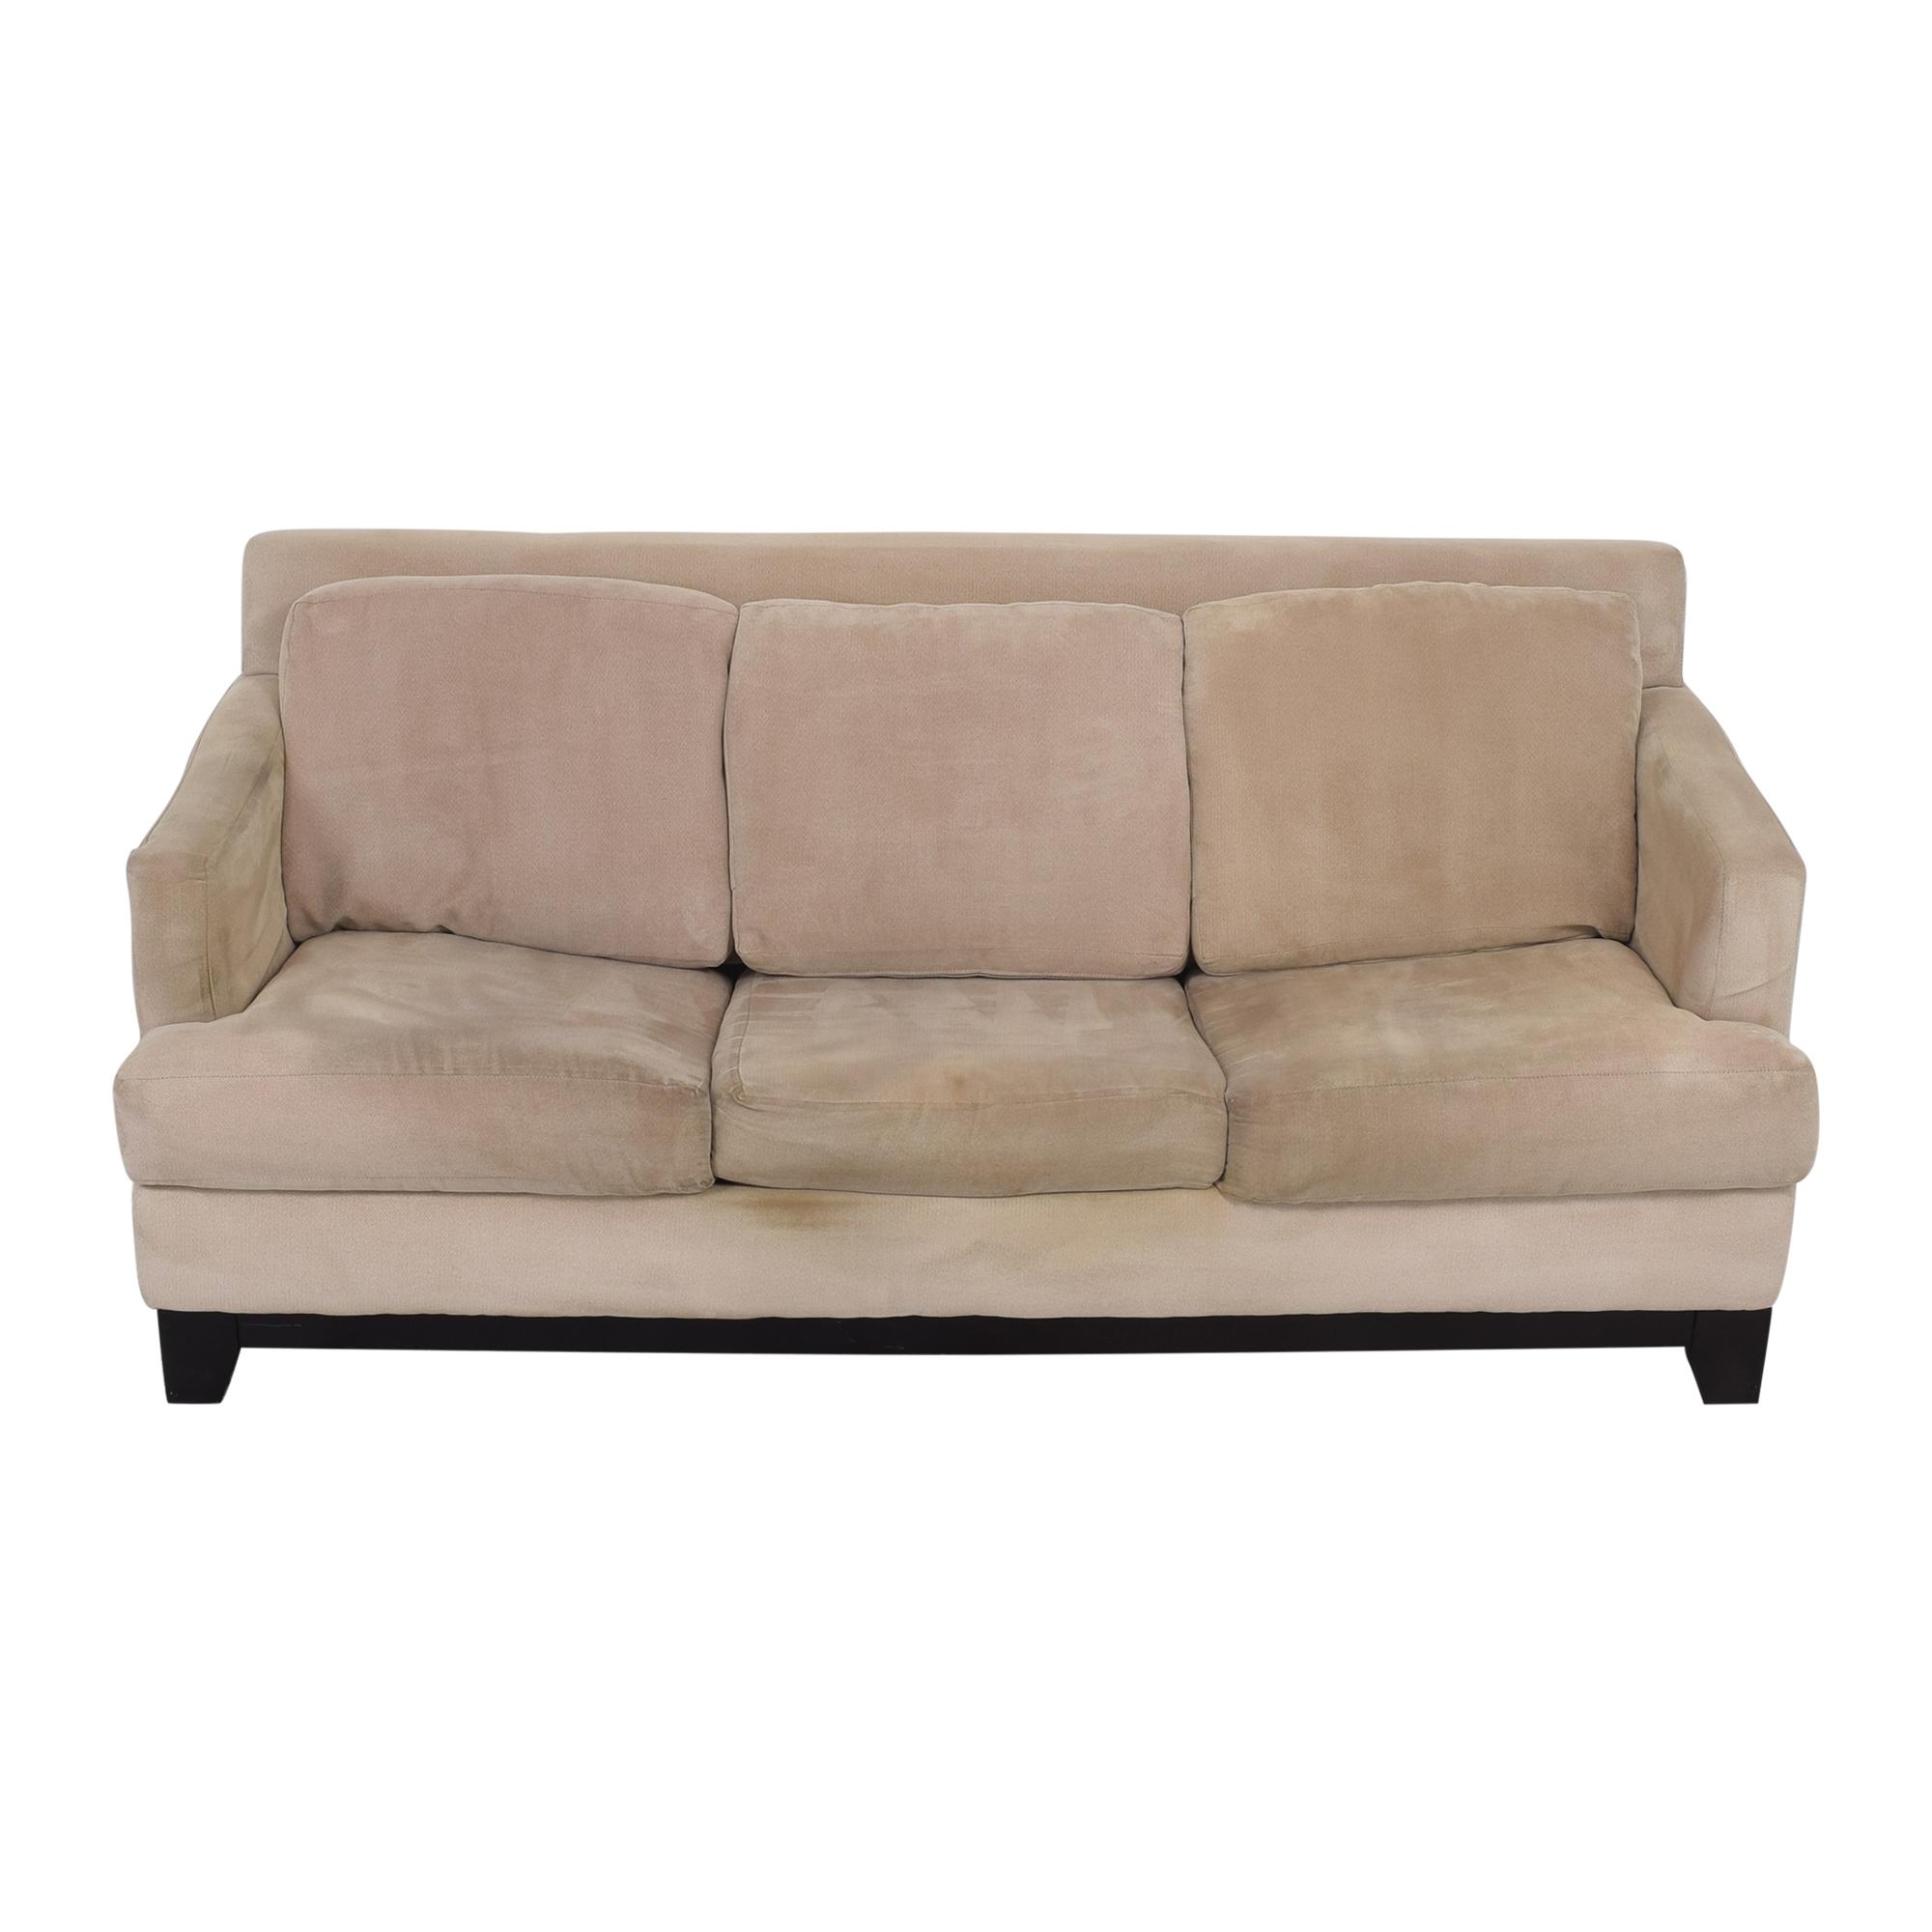 Macy's Macy's Sleeper Sofa discount